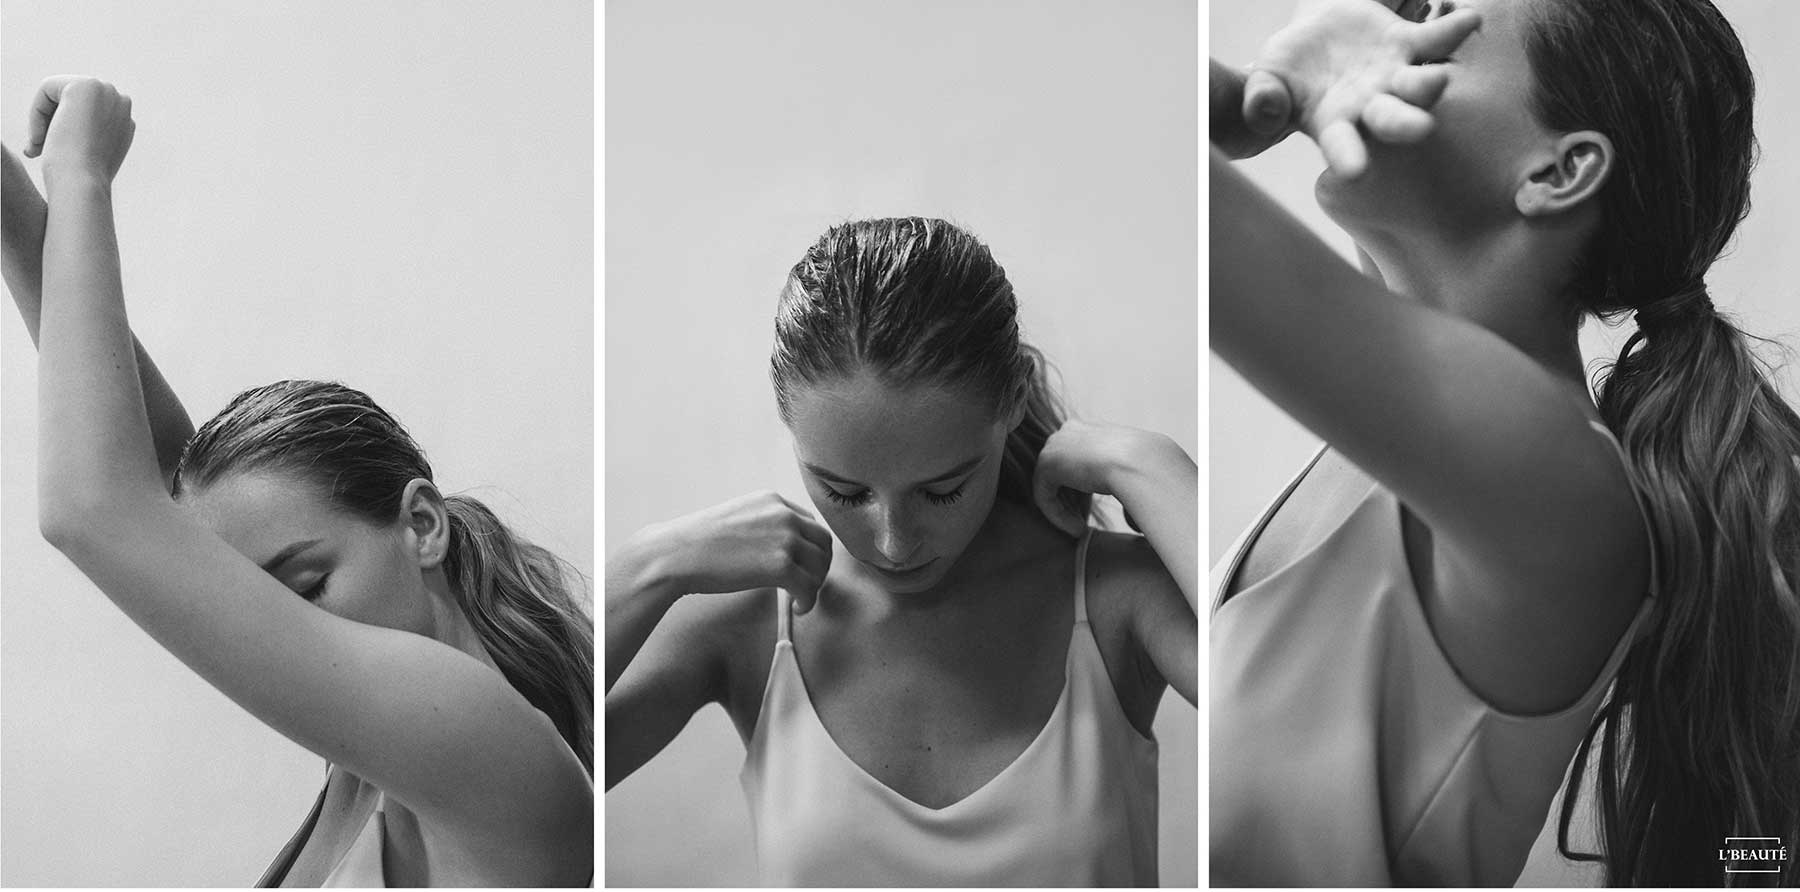 Beauty-Dyson-Pelo-Airwrap